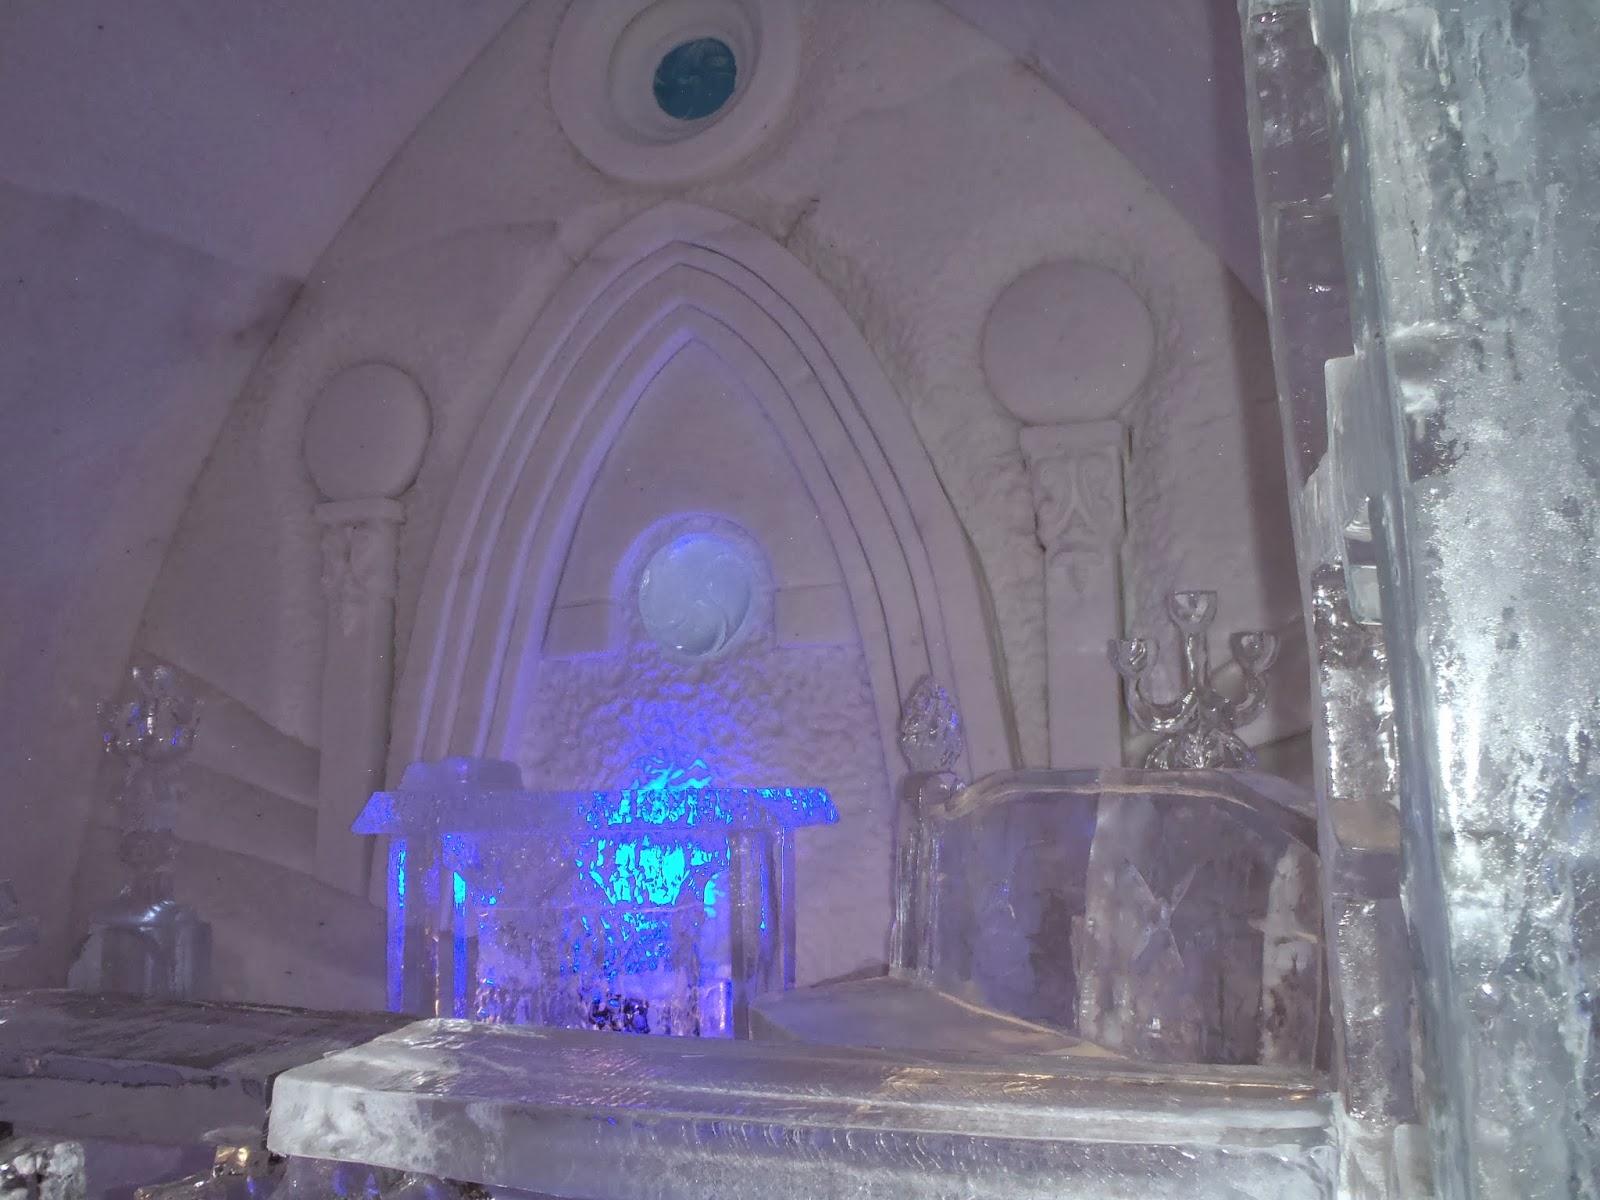 Hotel De Glace ice chapel